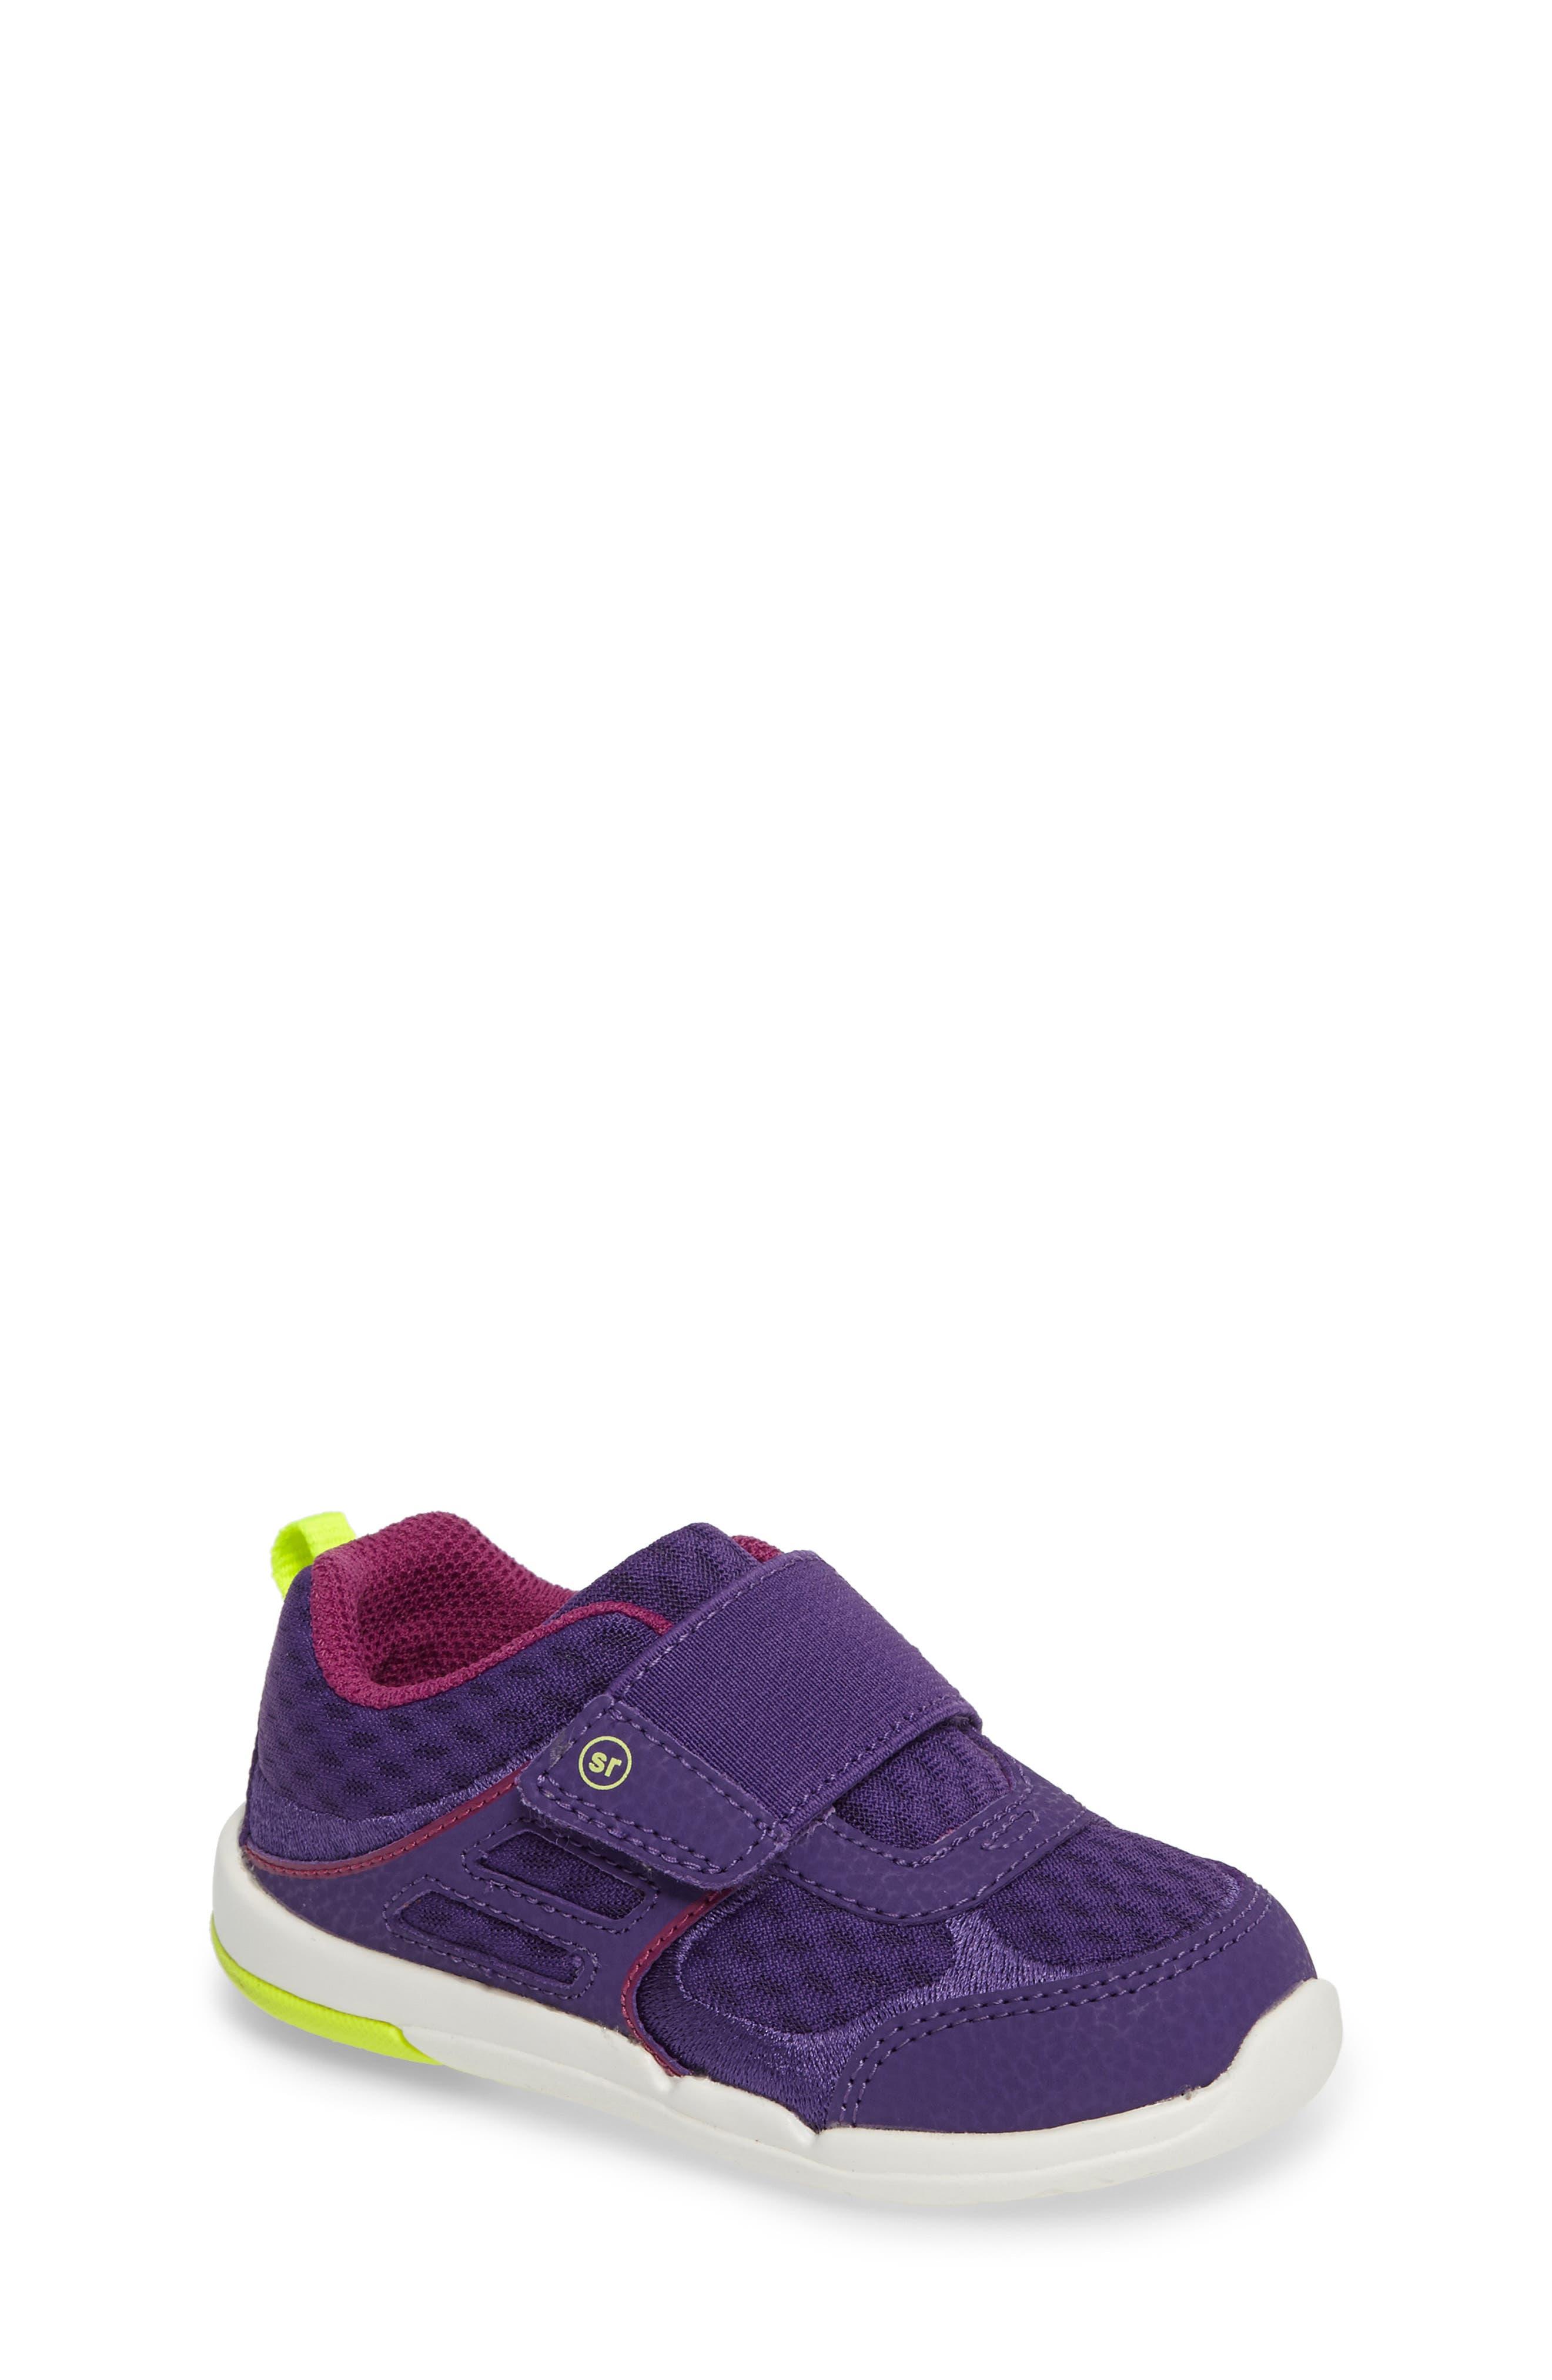 Casey Sneaker,                         Main,                         color, Purple